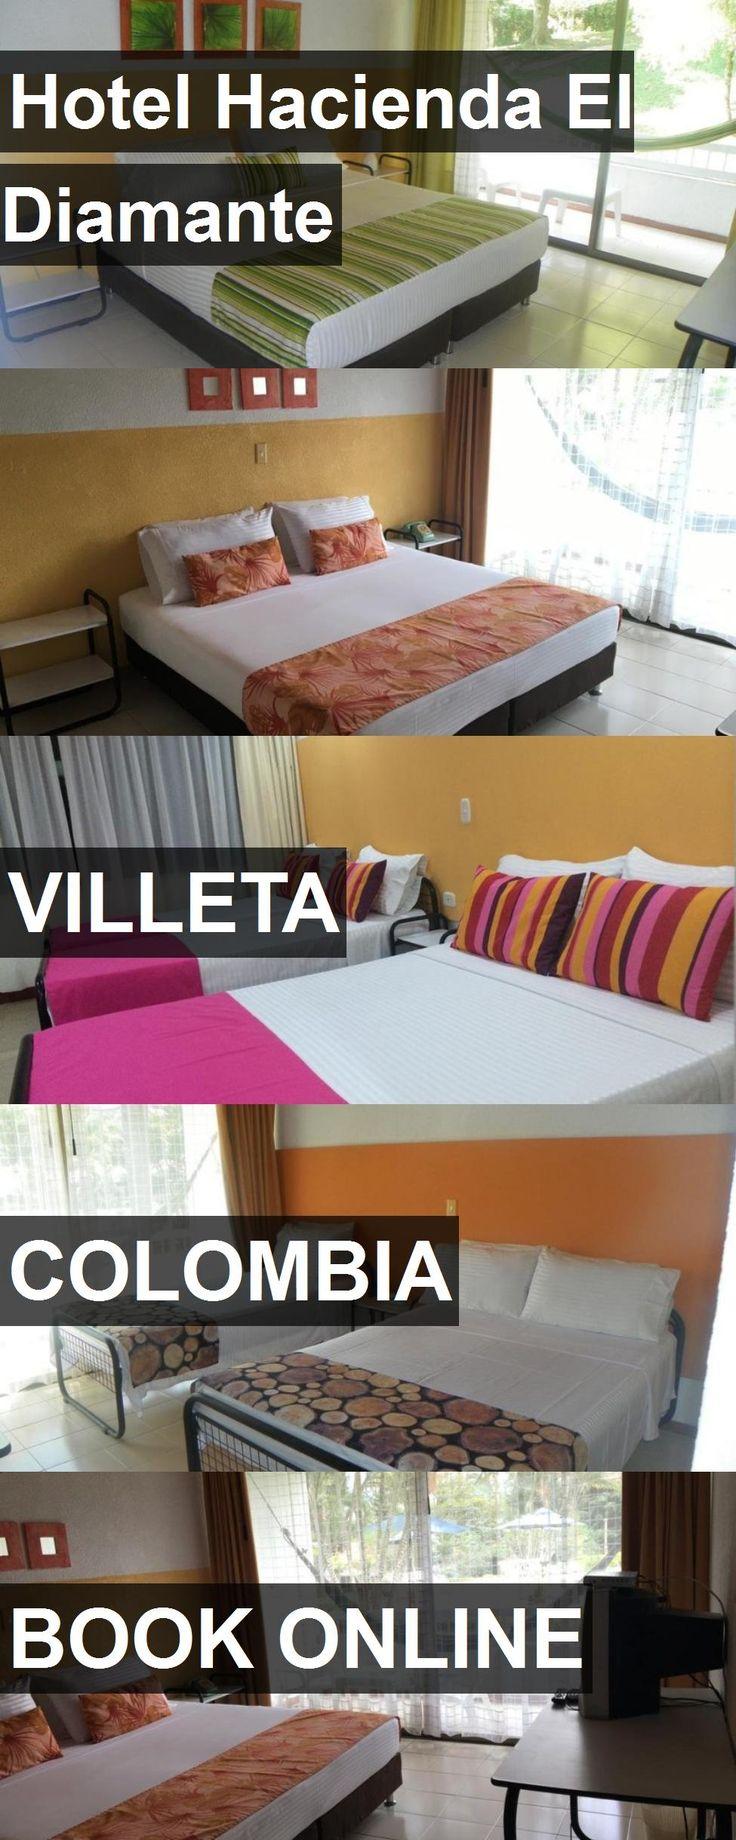 Hotel Hacienda El Diamante in Villeta, Colombia. For more information, photos, reviews and best prices please follow the link. #Colombia #Villeta #travel #vacation #hotel